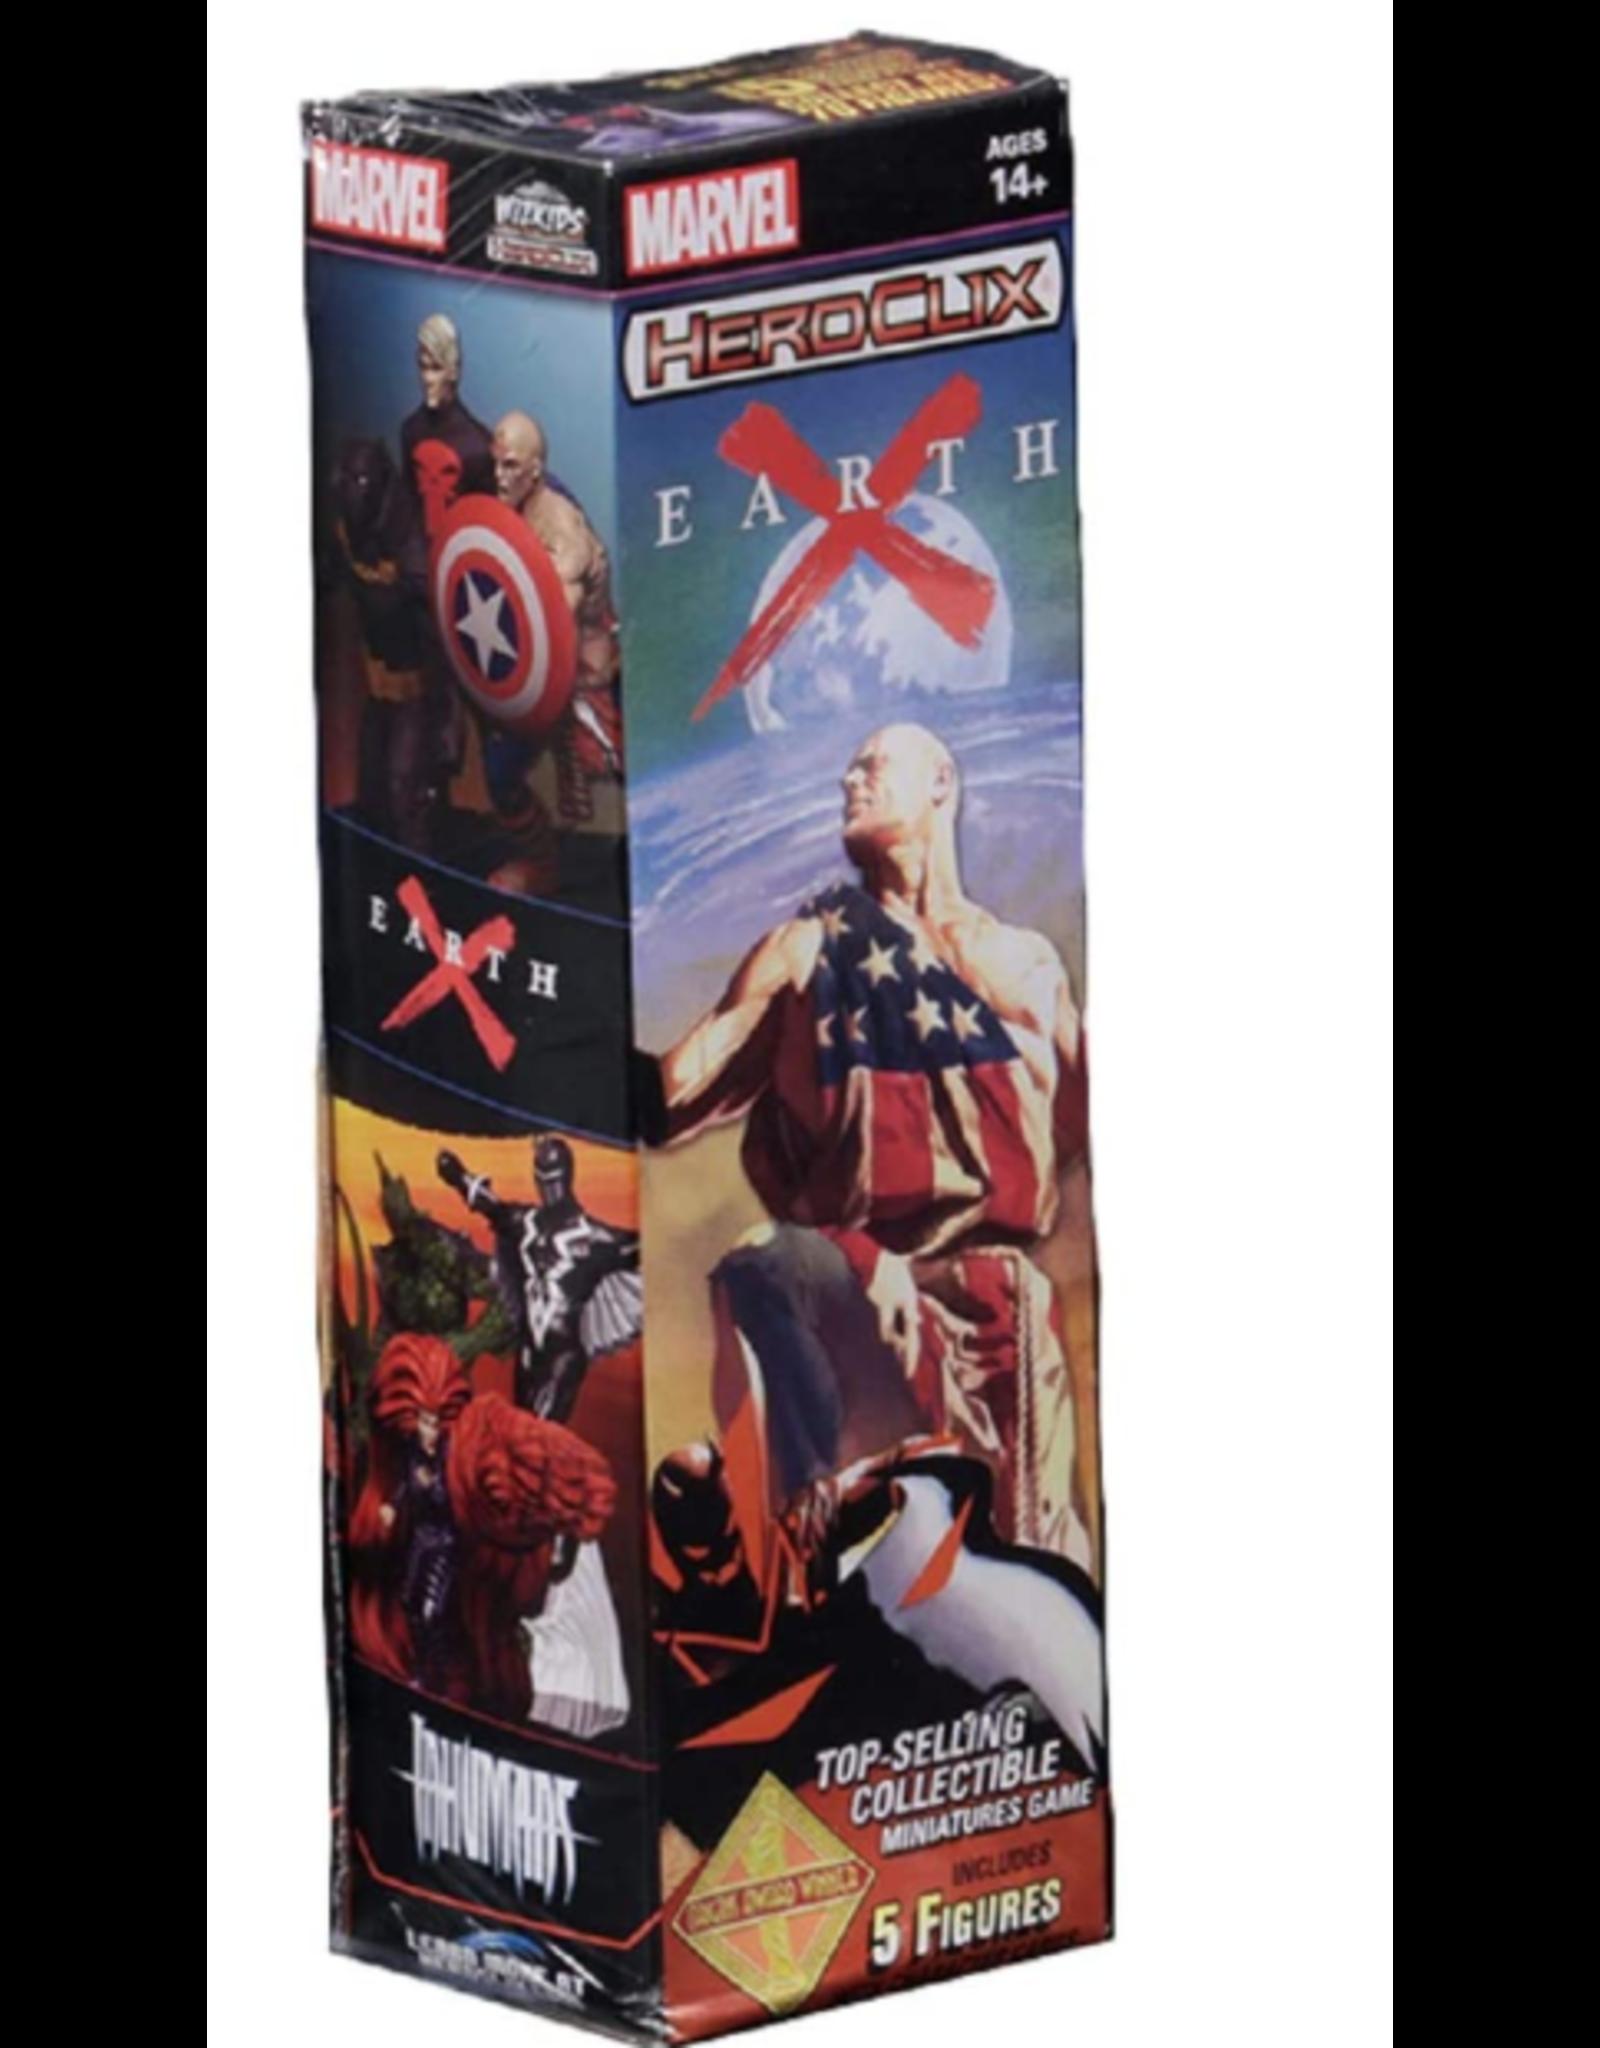 Wizkids Marvel HeroClix: Earth X Booster Pack